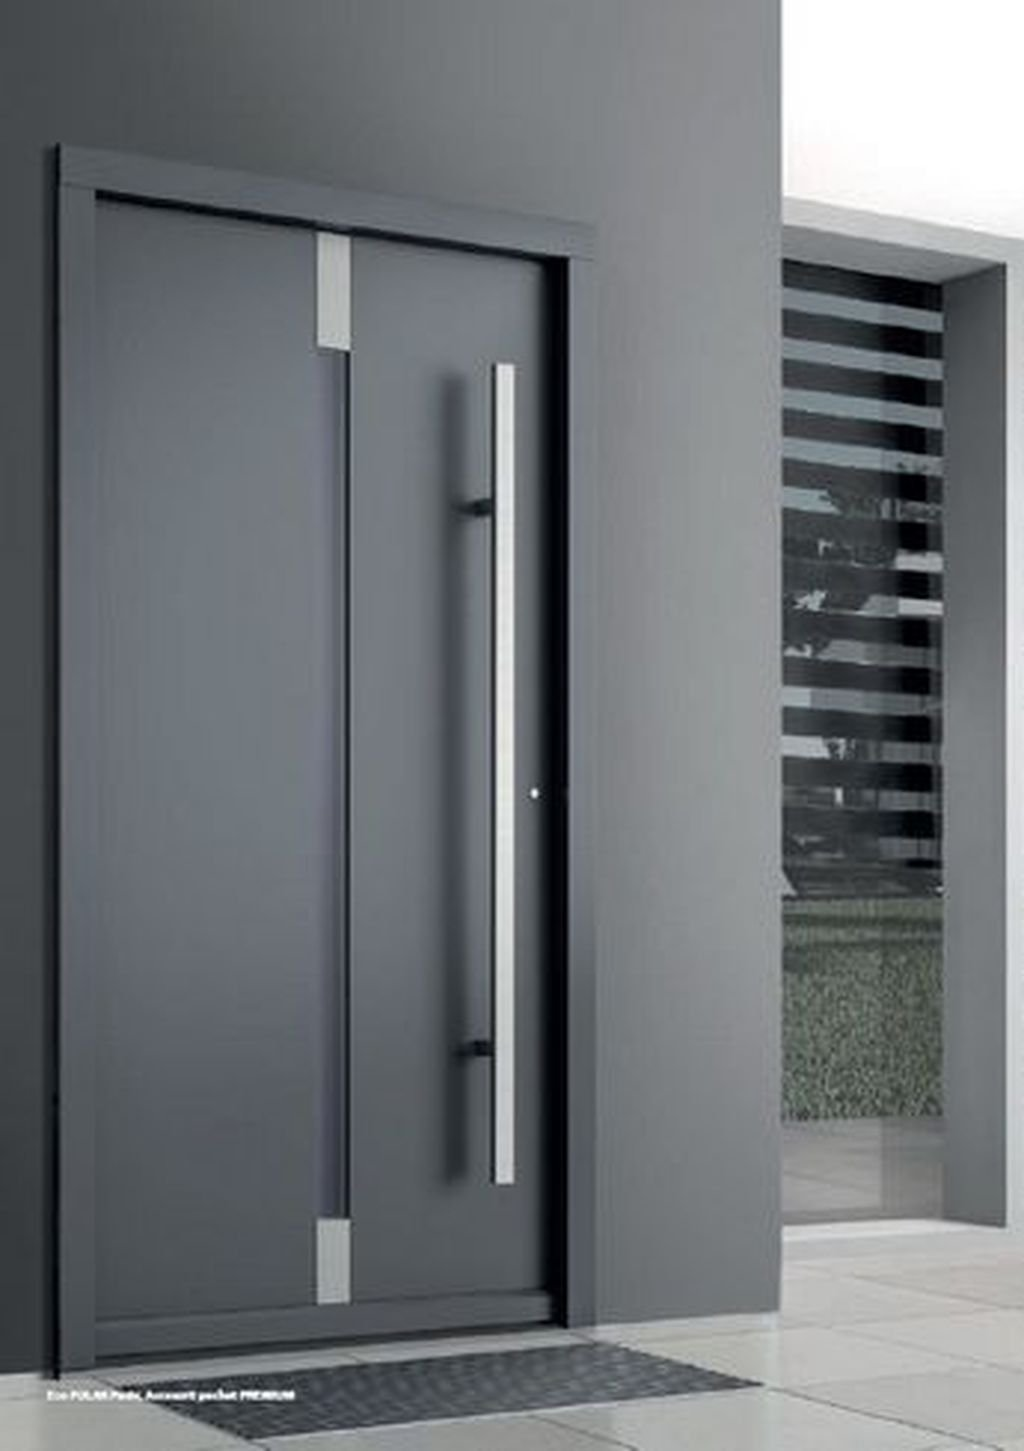 The Best Modern Front Entrance Exterior Design Ideas 32